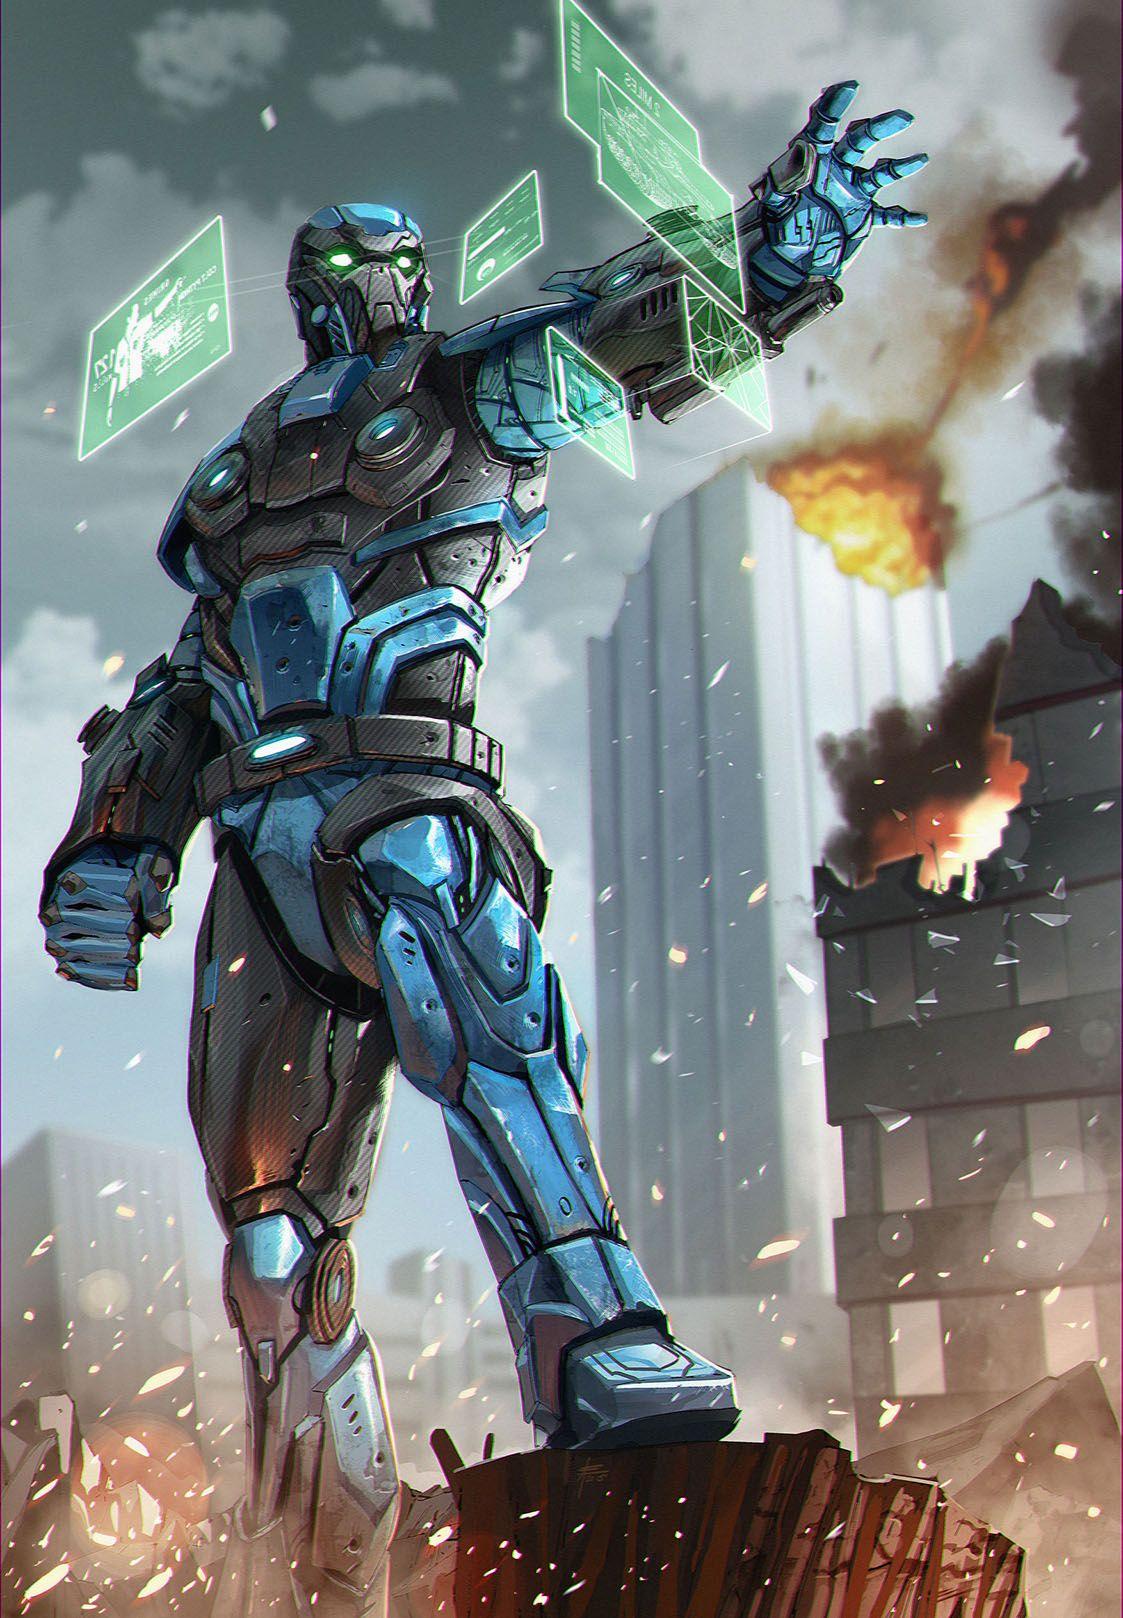 Cyber Elite Guard | Cyberpunk | Pinterest | Cyber, Sci fi ...